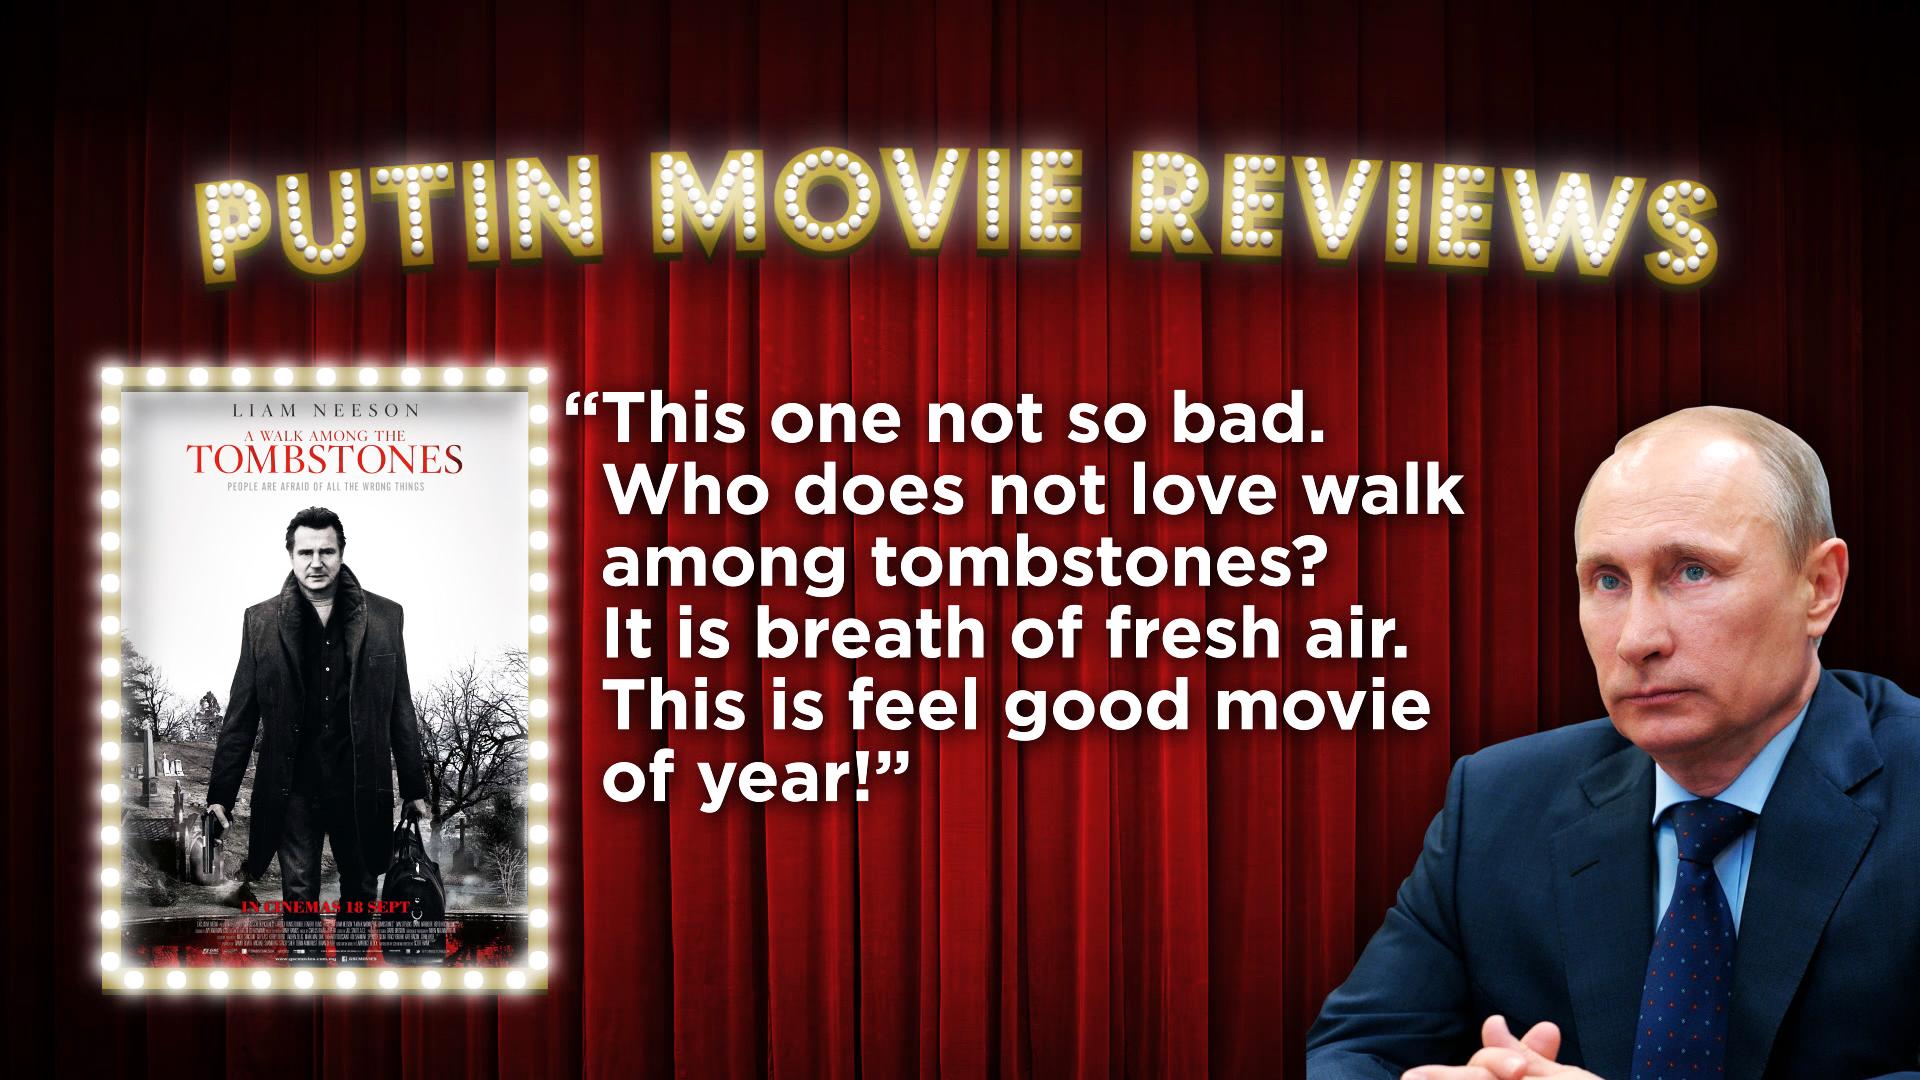 Movie content reviews